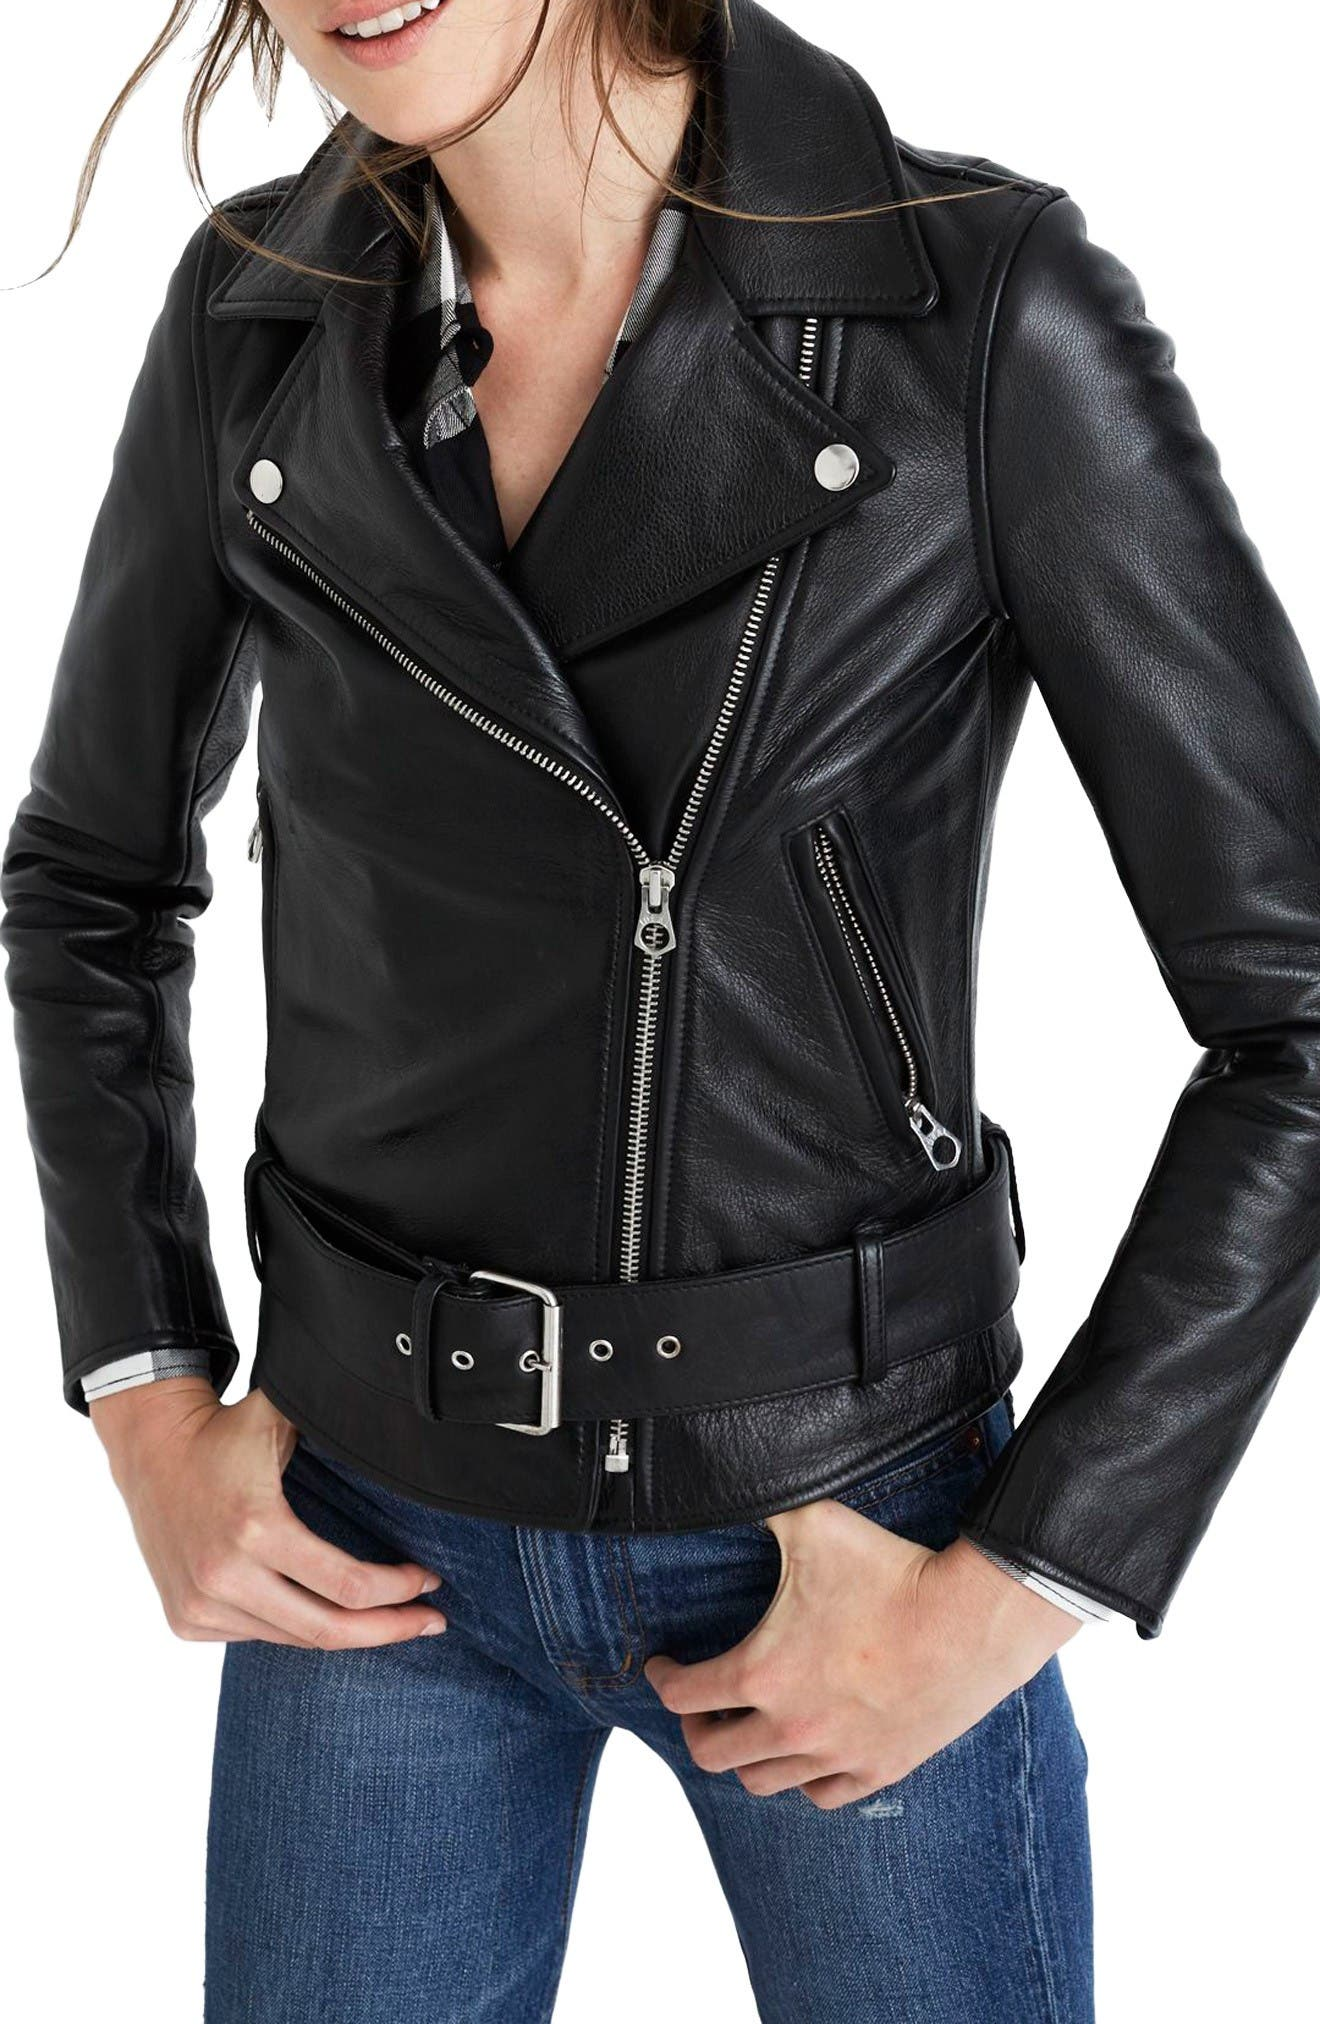 Alternate Image 1 Selected - Madewell Ultimate Leather Jacket